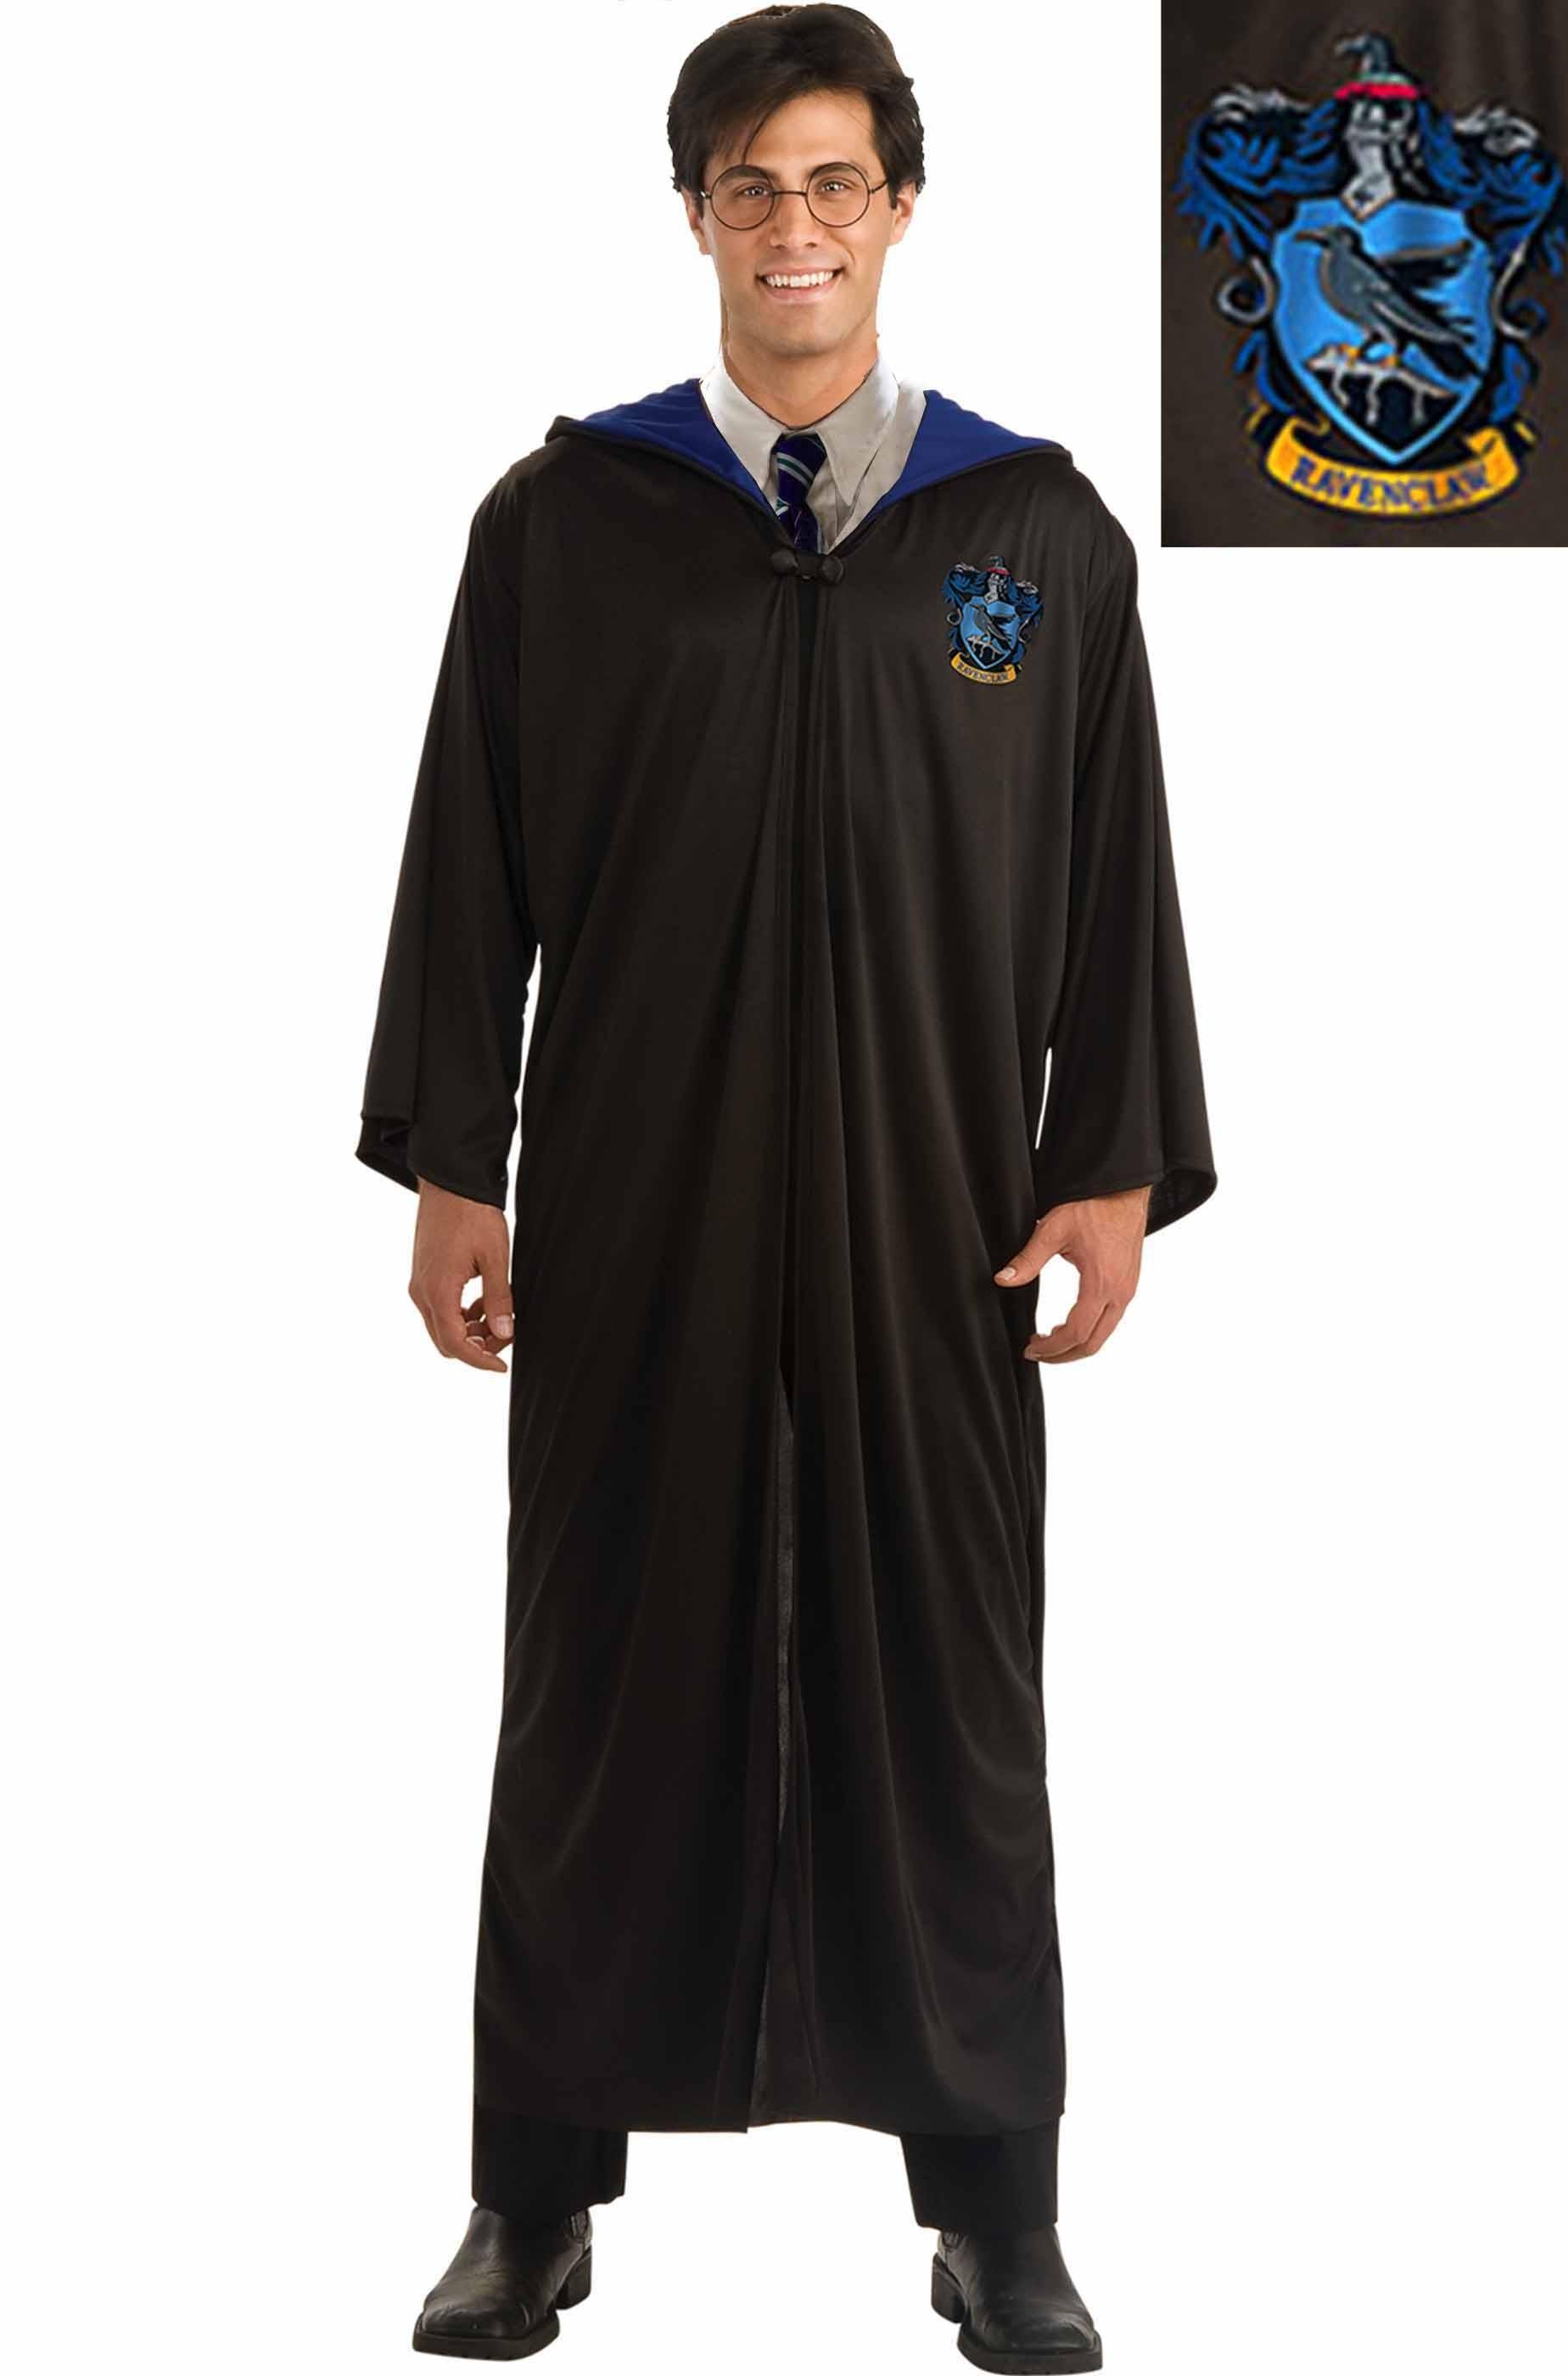 Vendita Online Di Costumi Di Carnevale Di Harry Potter Per Bambini